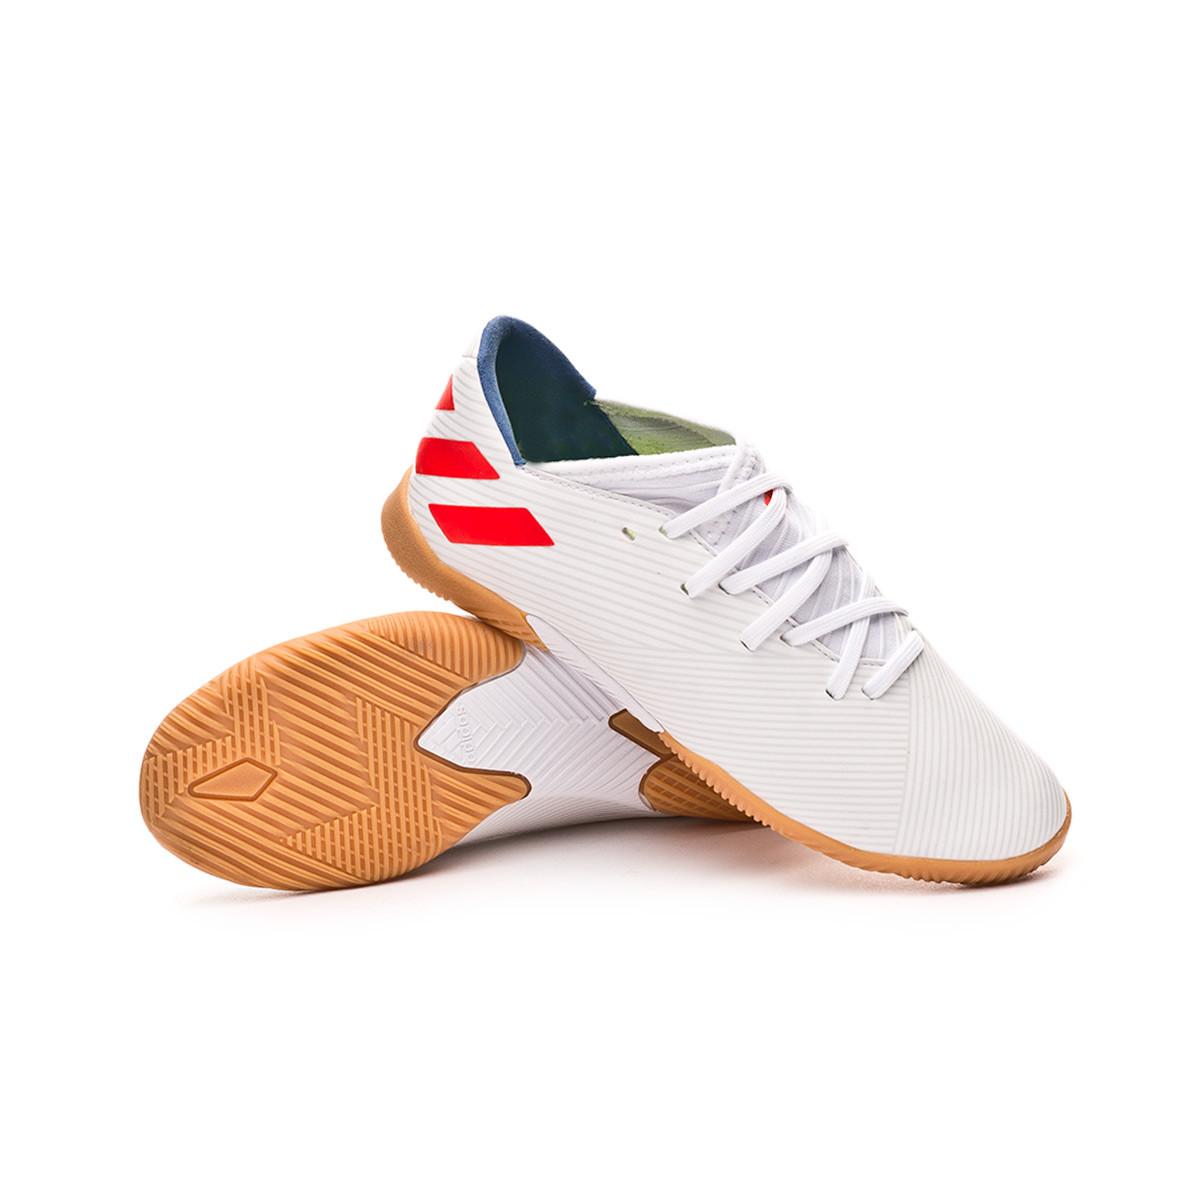 Sapatilha de Futsal adidas Nemeziz Messi 19.3 IN Crianças